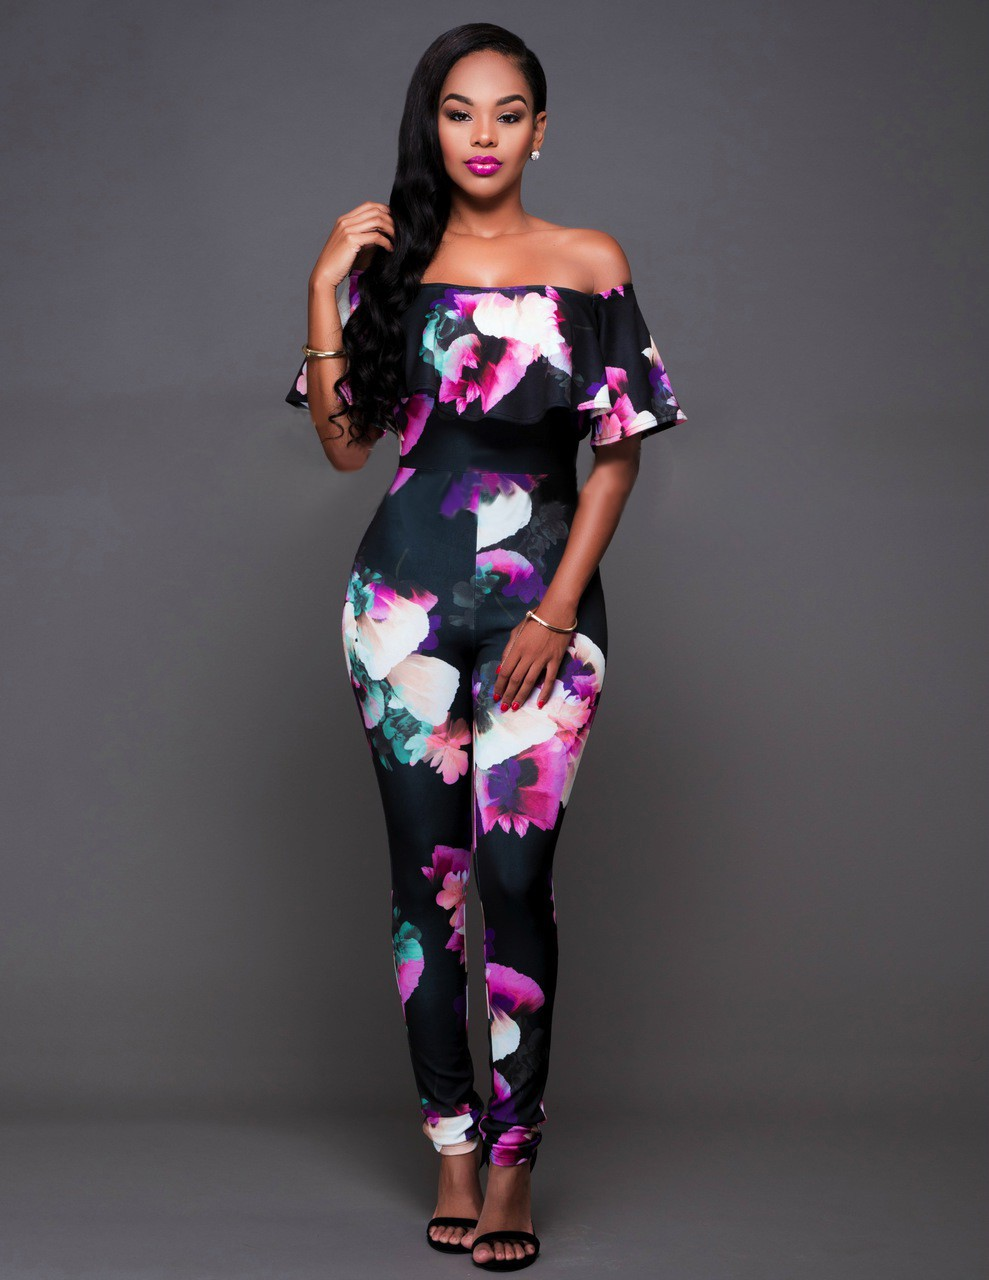 Laest Designer Beautiful Girls Women Club Evening Wear Sexy Jumpsuits For Women Sk8052 - Buy ...